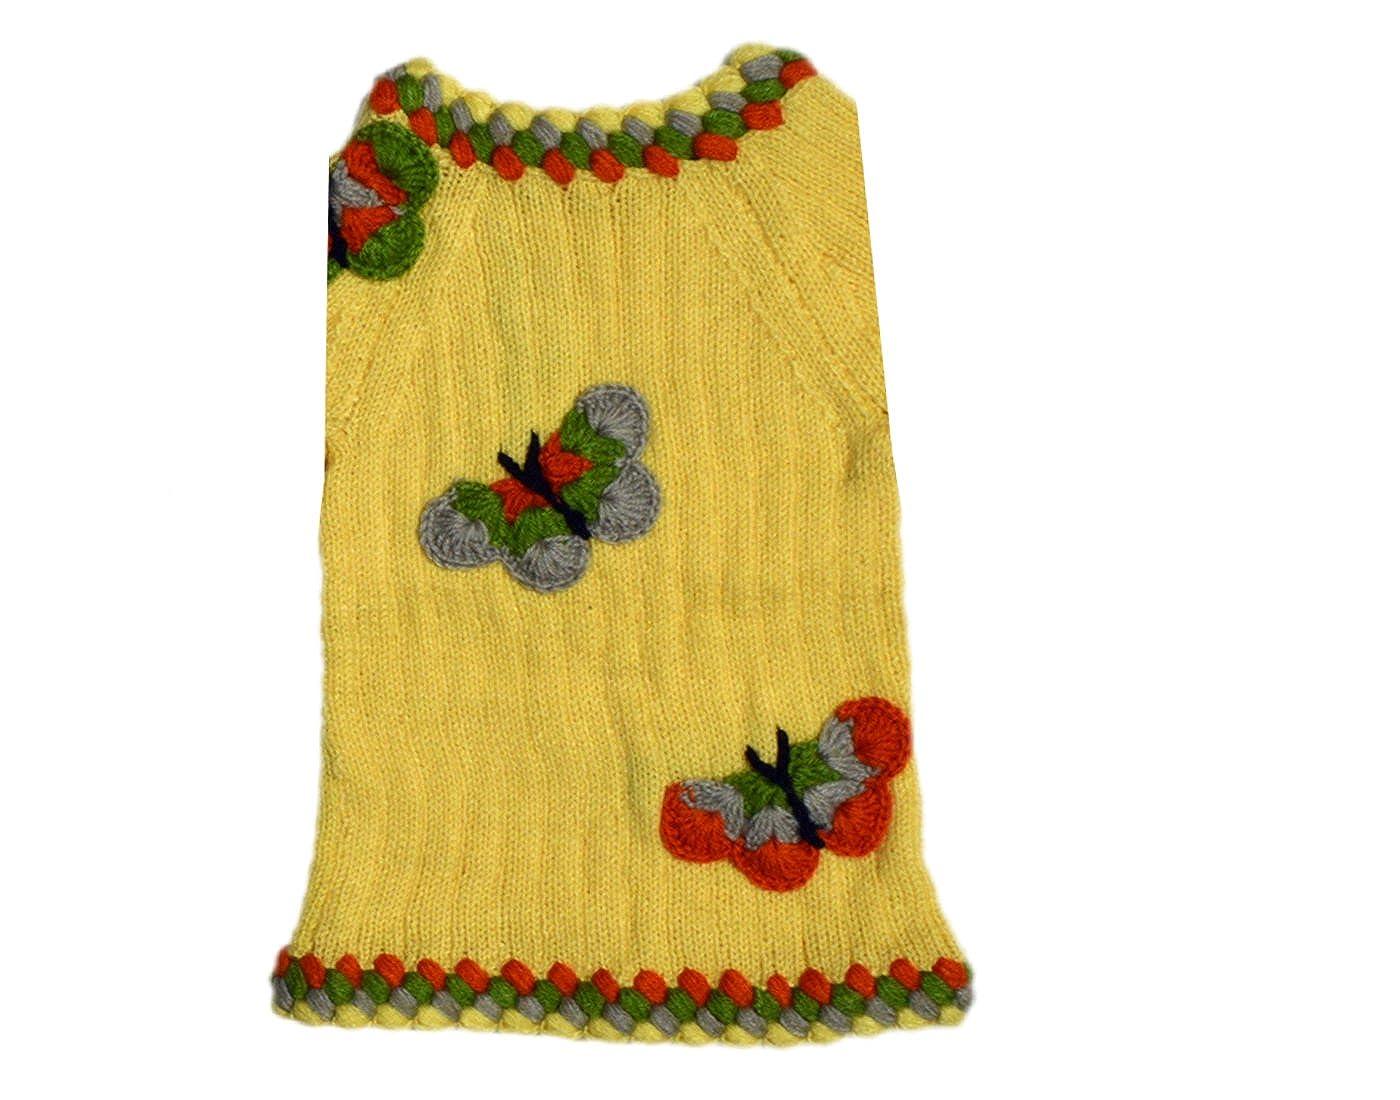 f6df49822 Hand Knitted Woolen Winter yellow Butterfly Girls Top Sweater!! 3-4 ...